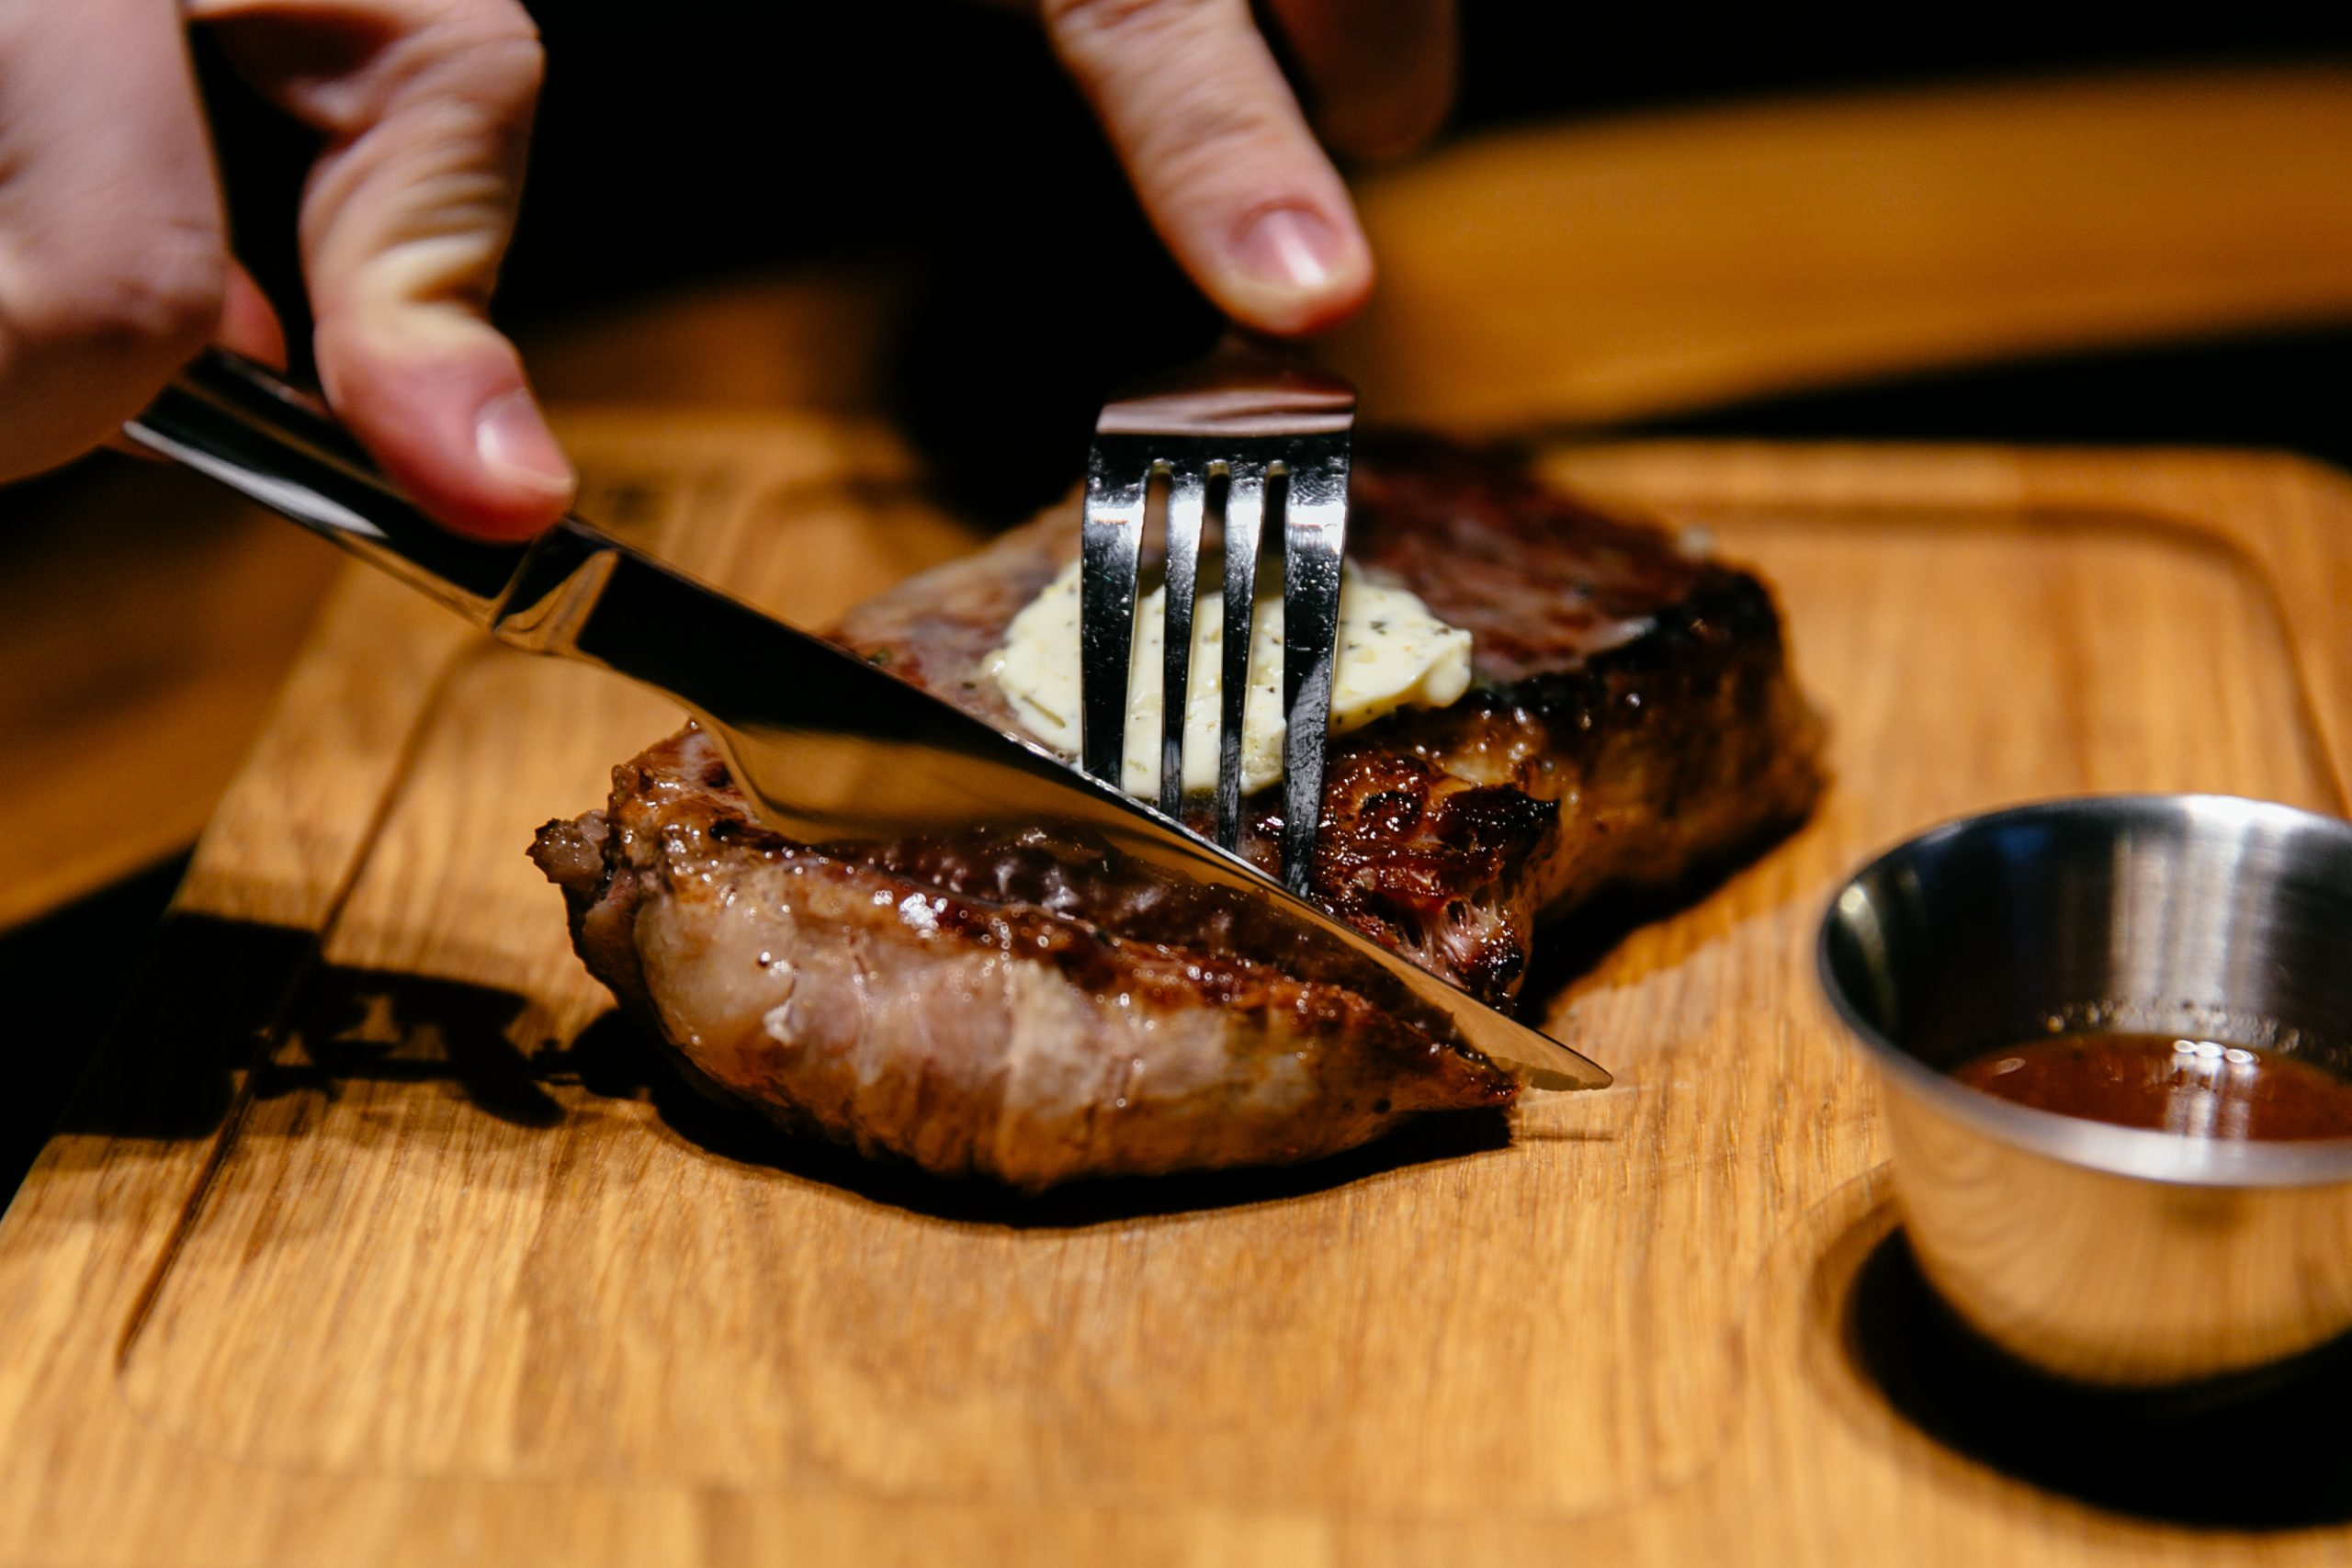 Cómo catar carne correctamente